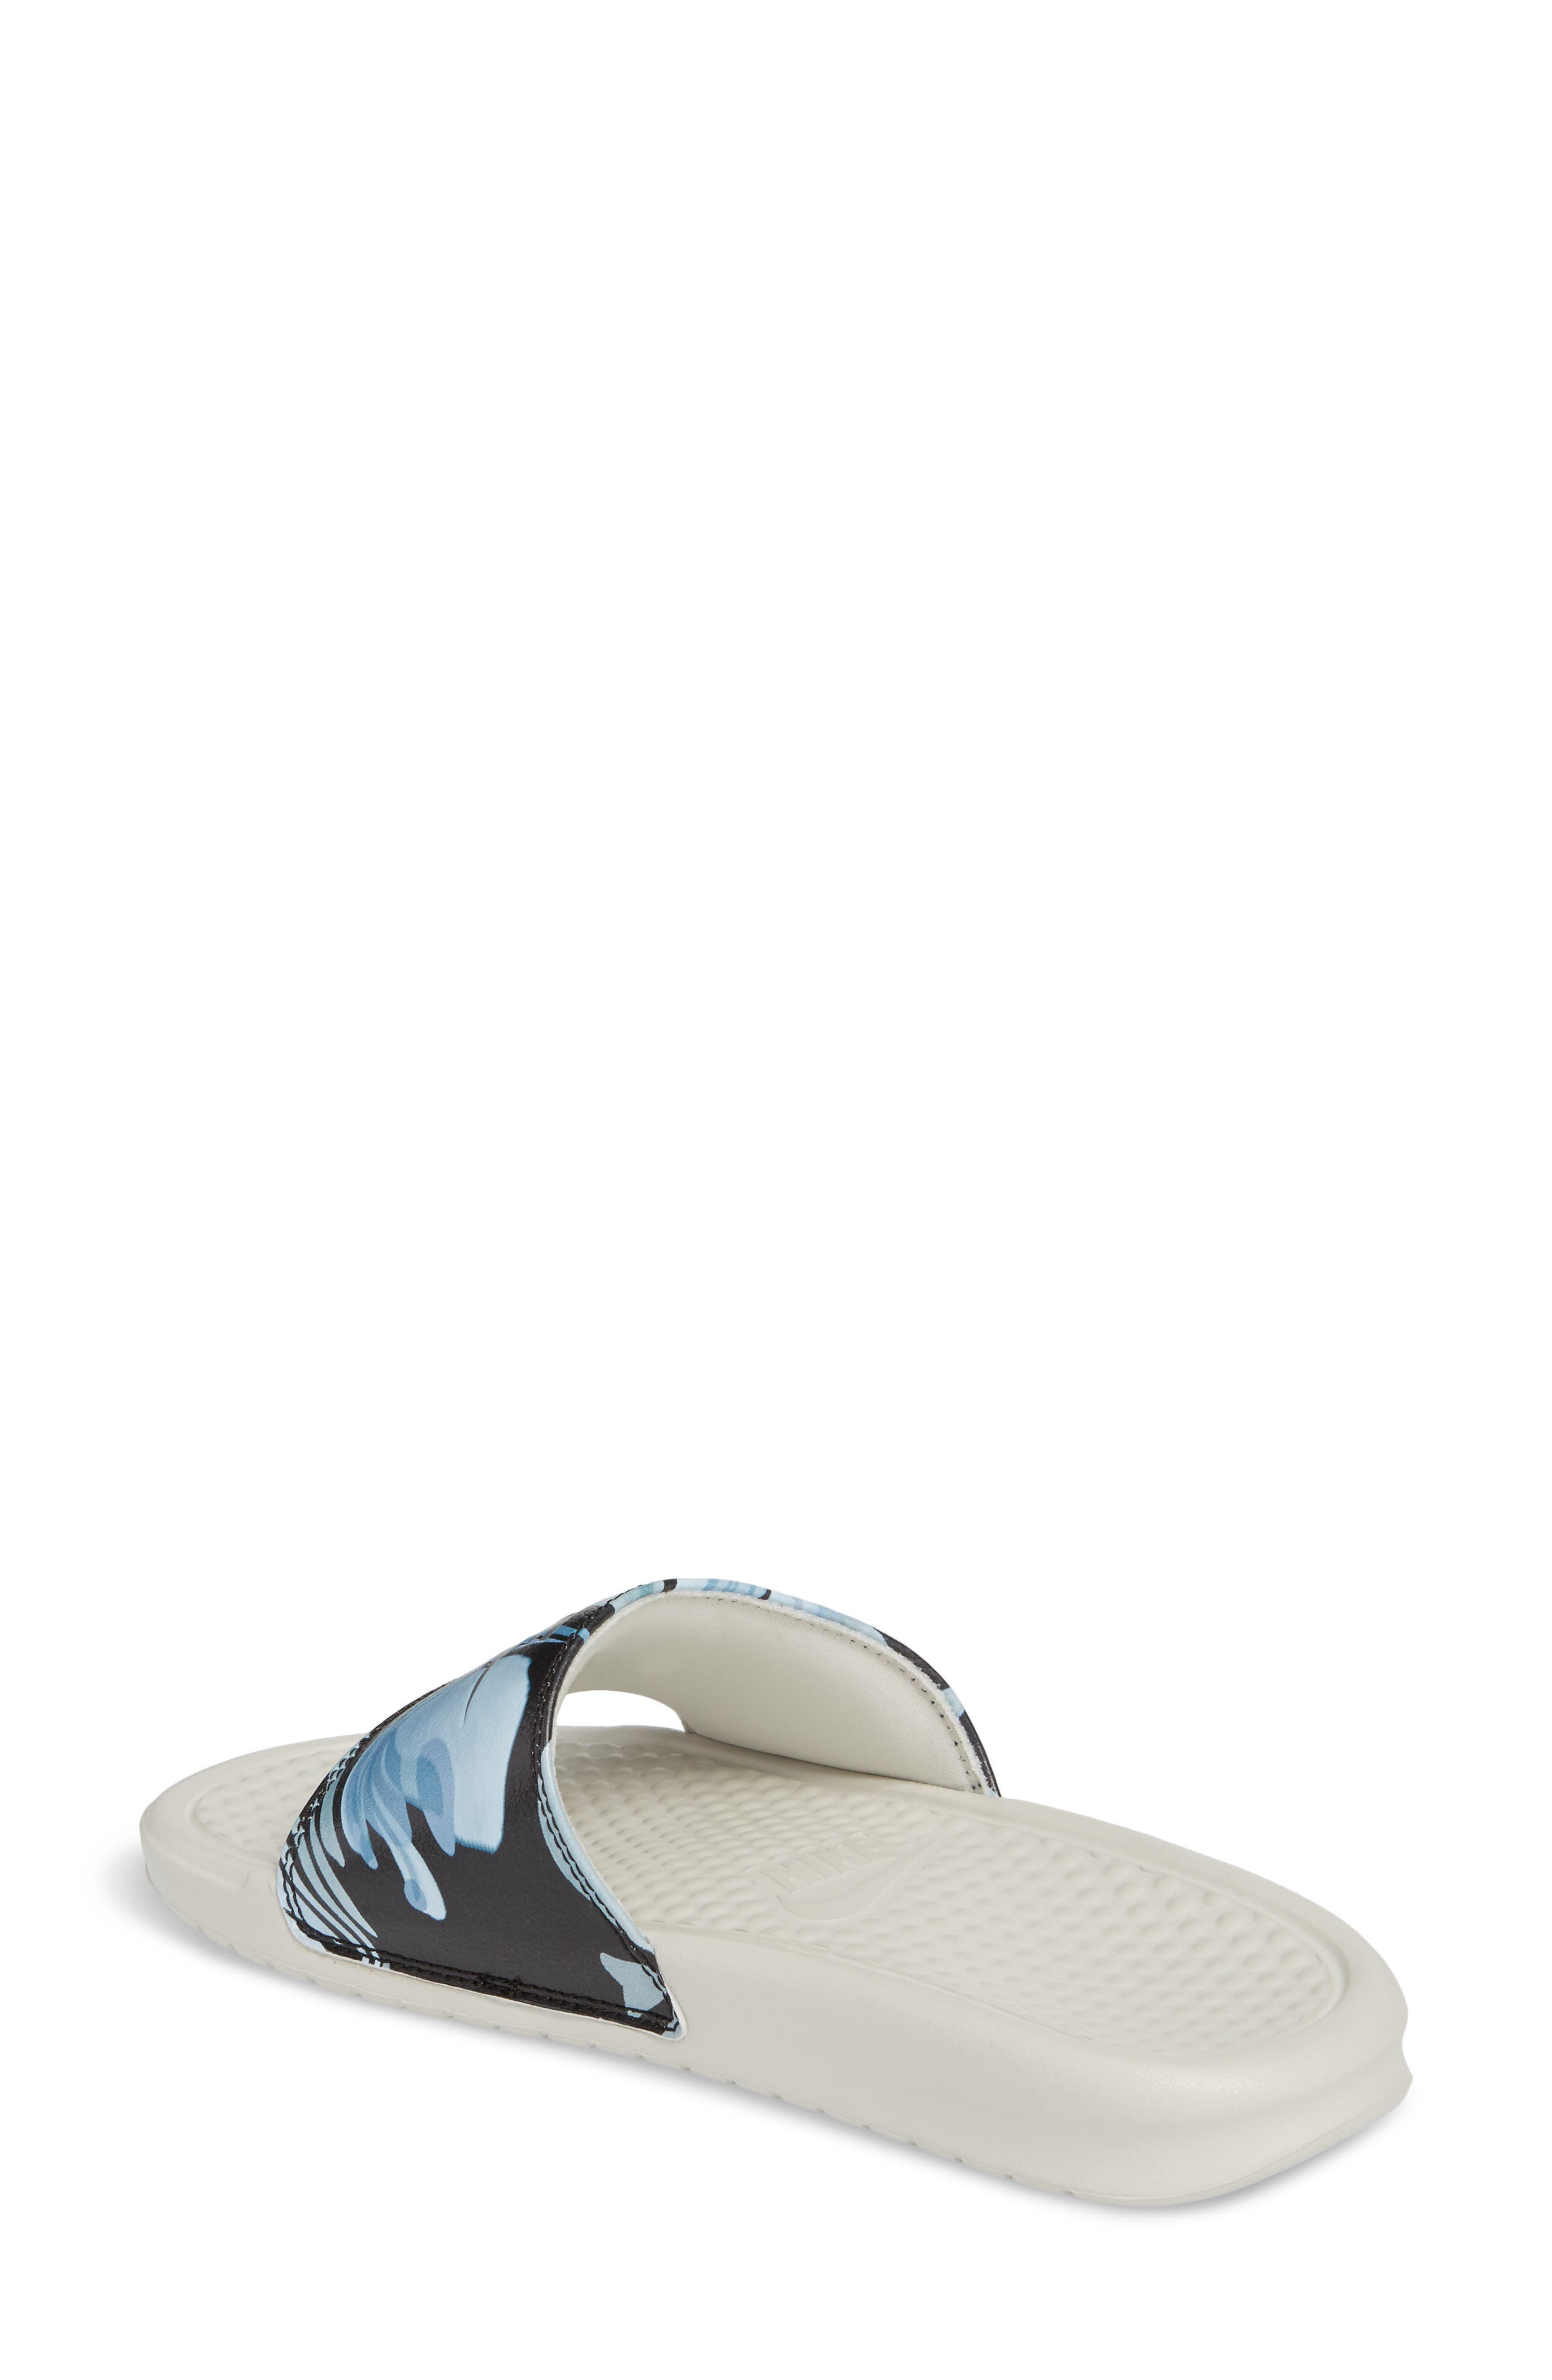 Alternate Image 2  - Nike 'Benassi - Just Do It' Print Sandal (Women)